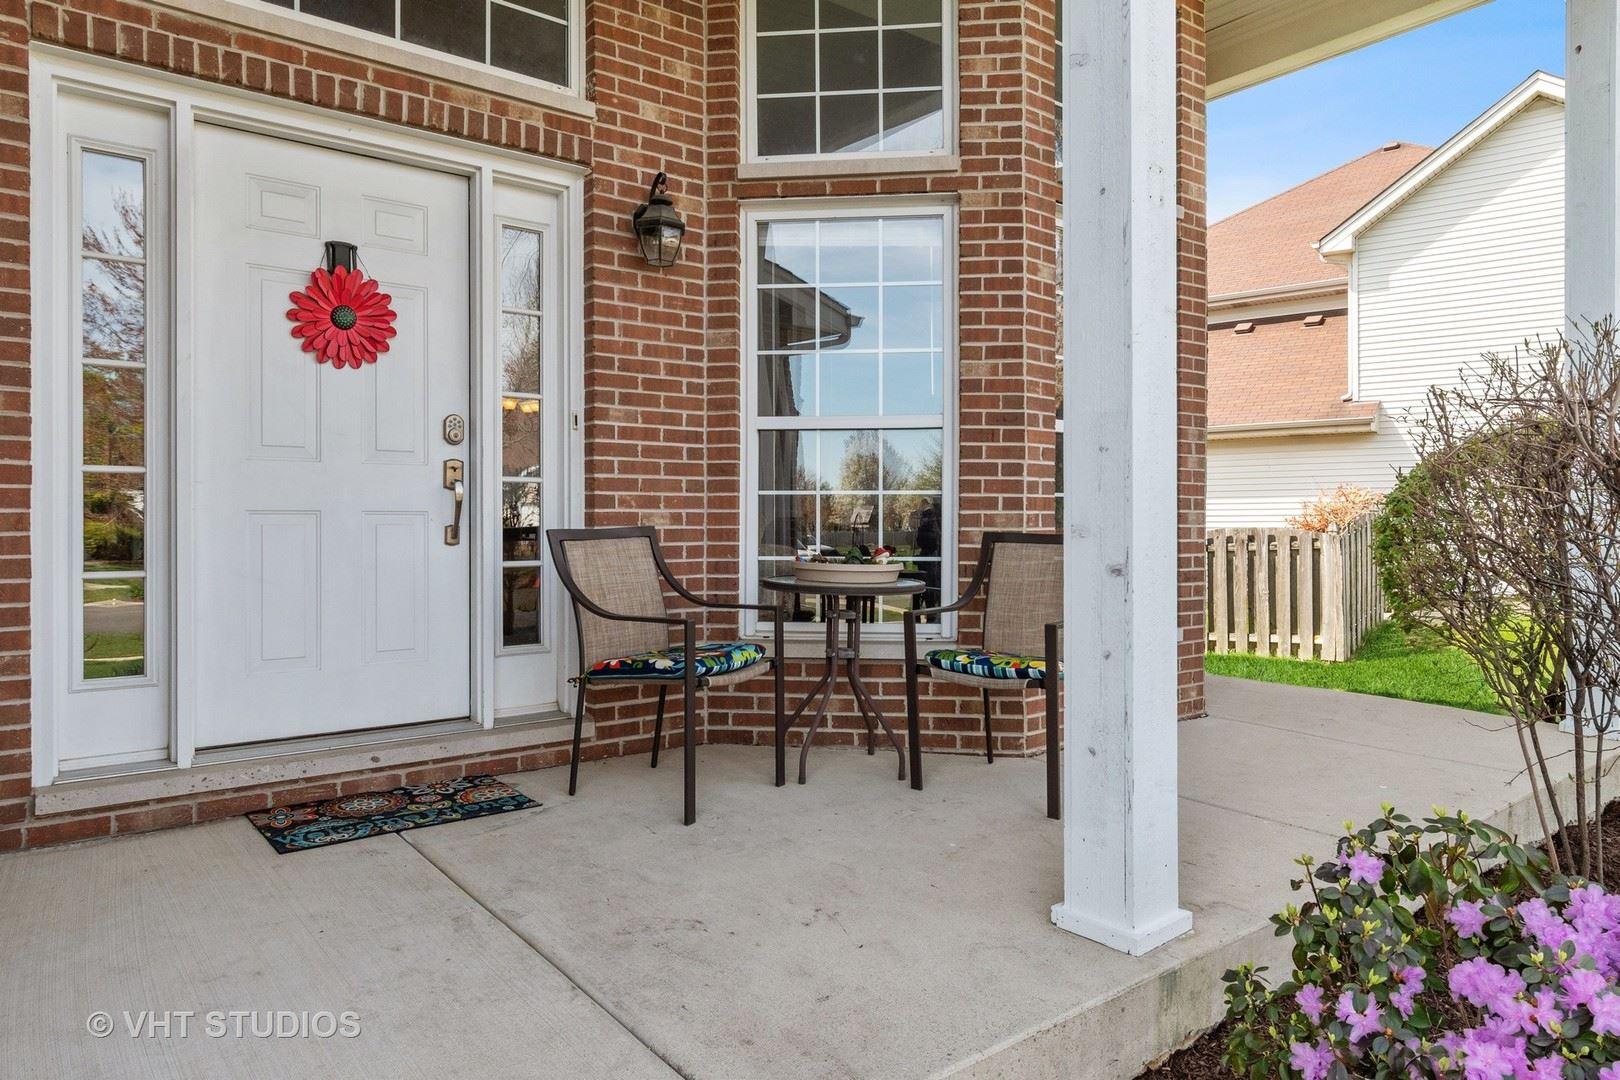 Photo of 24249 Norwood Drive, Plainfield, IL 60585 (MLS # 11060728)